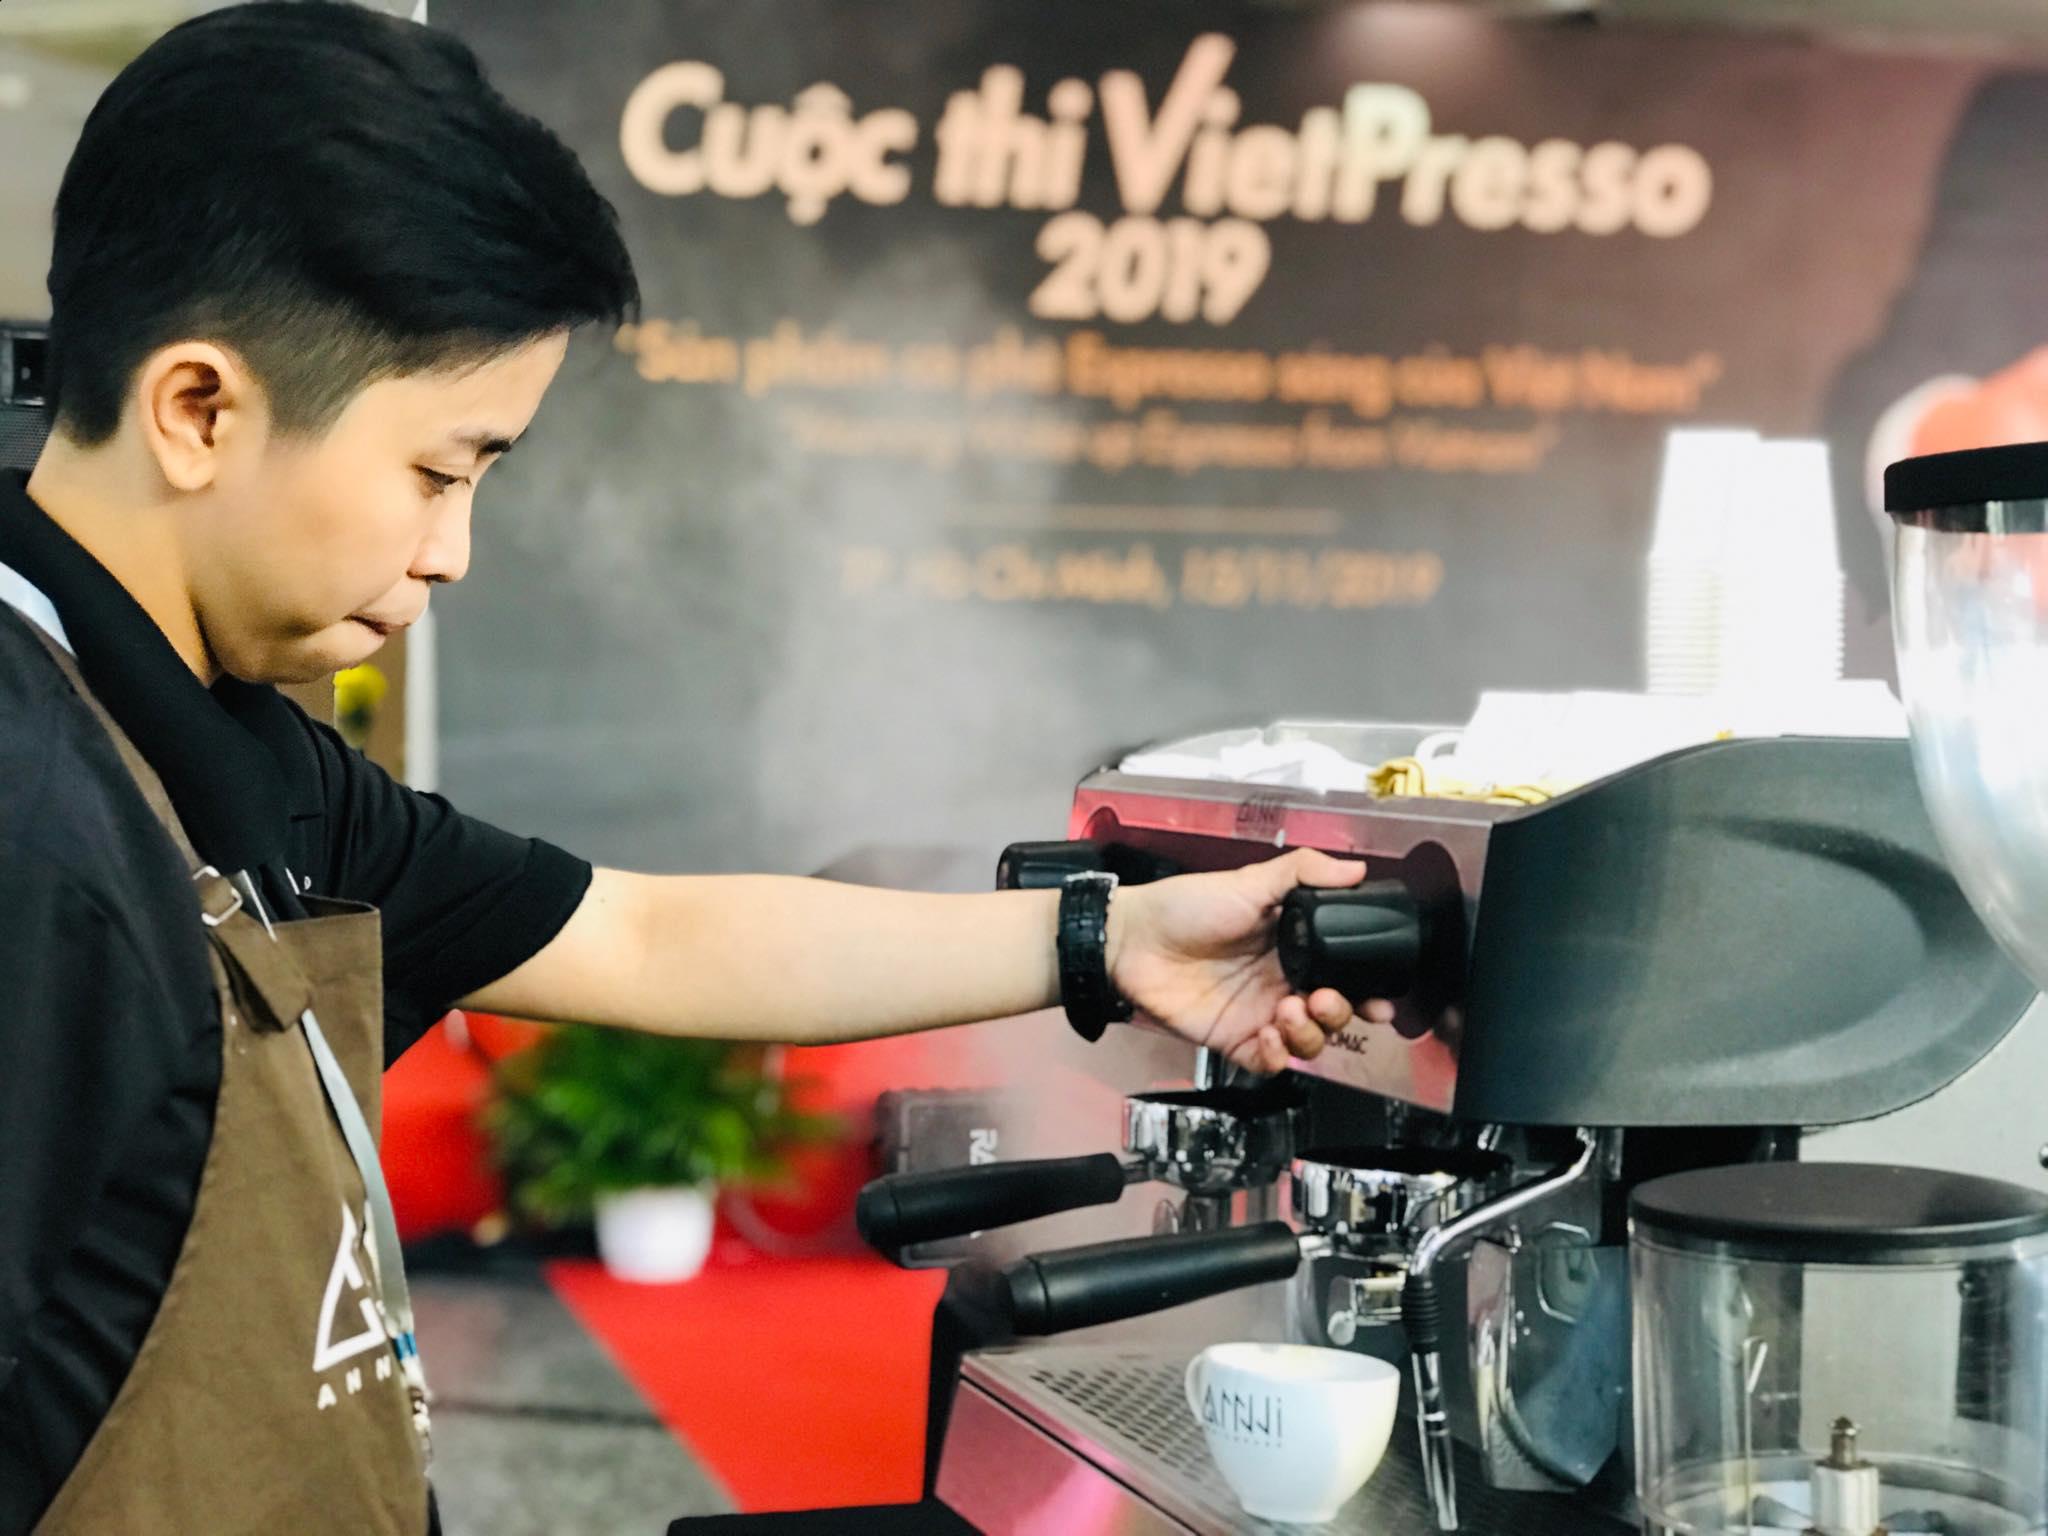 ANNI COFFEE - Cuộc thi Pha chế Espresso Việt